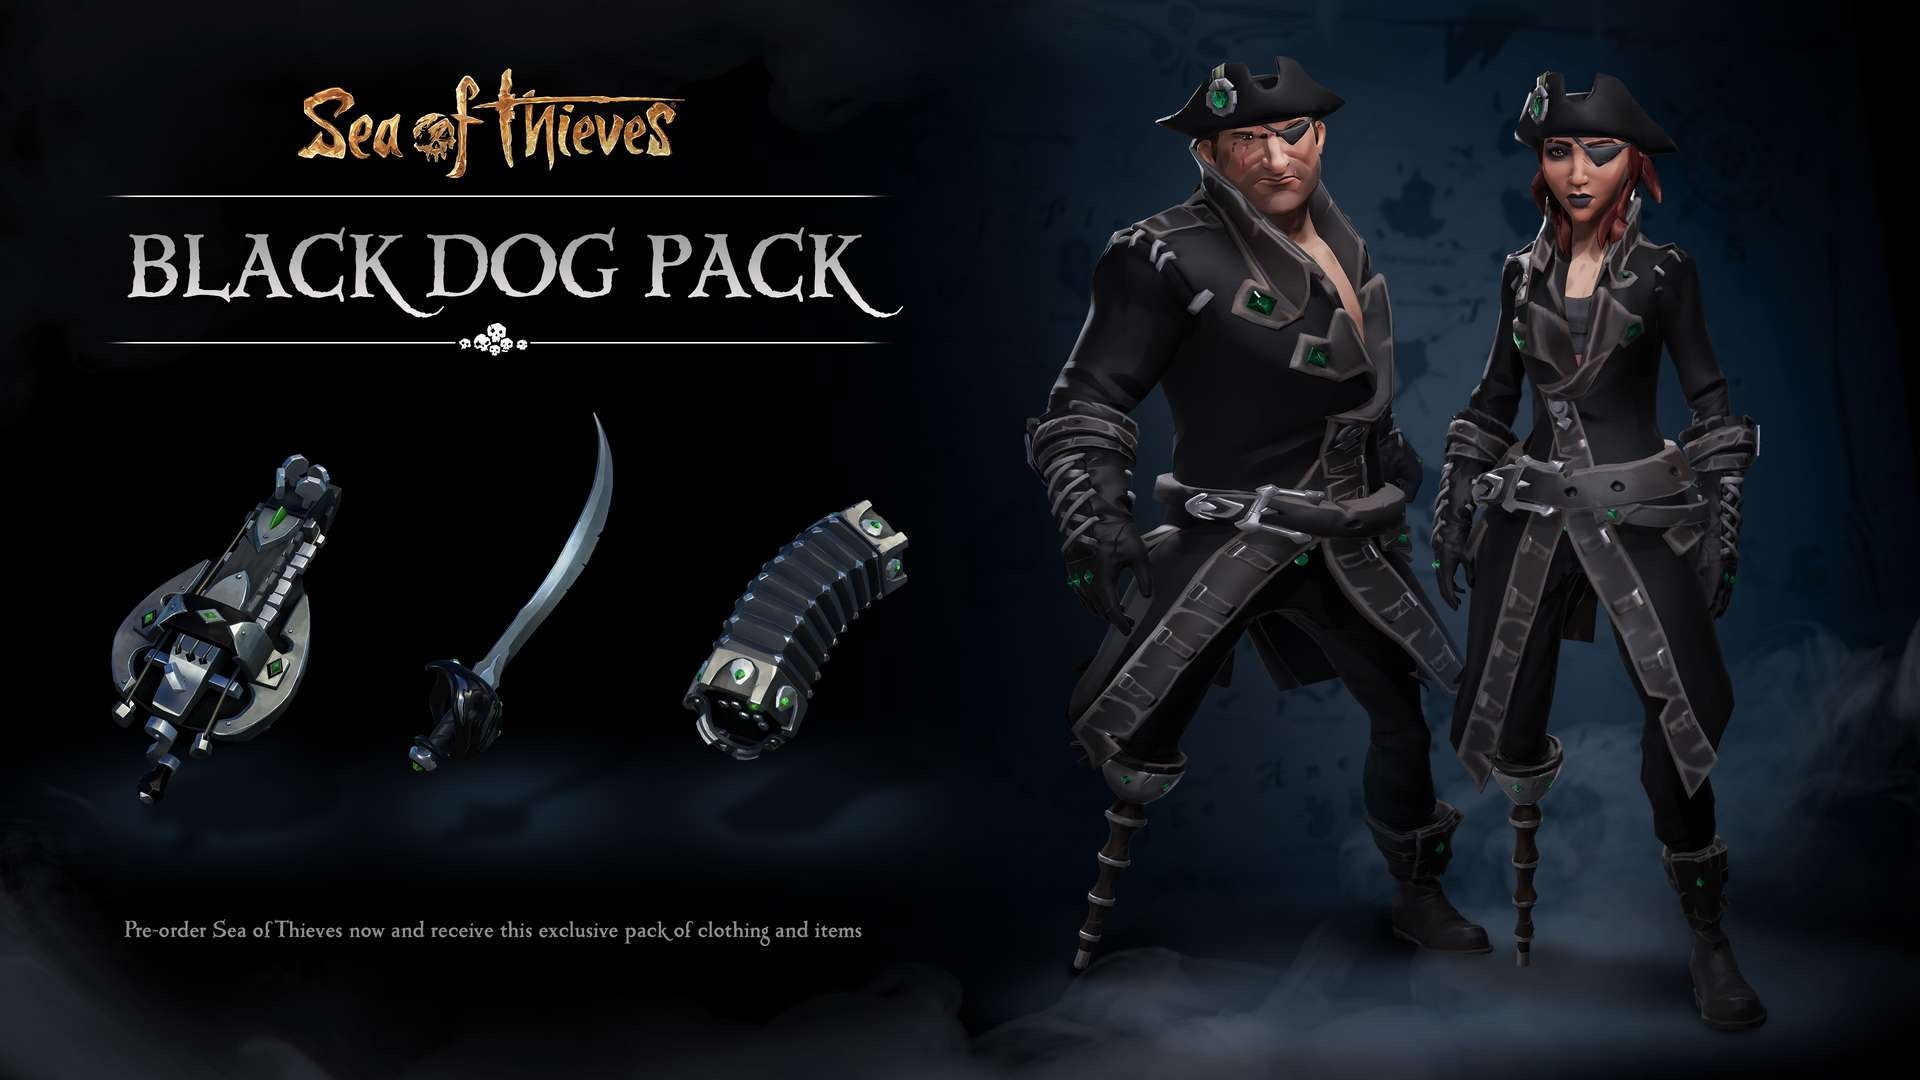 Sea of Thieves – Black Dog Pack